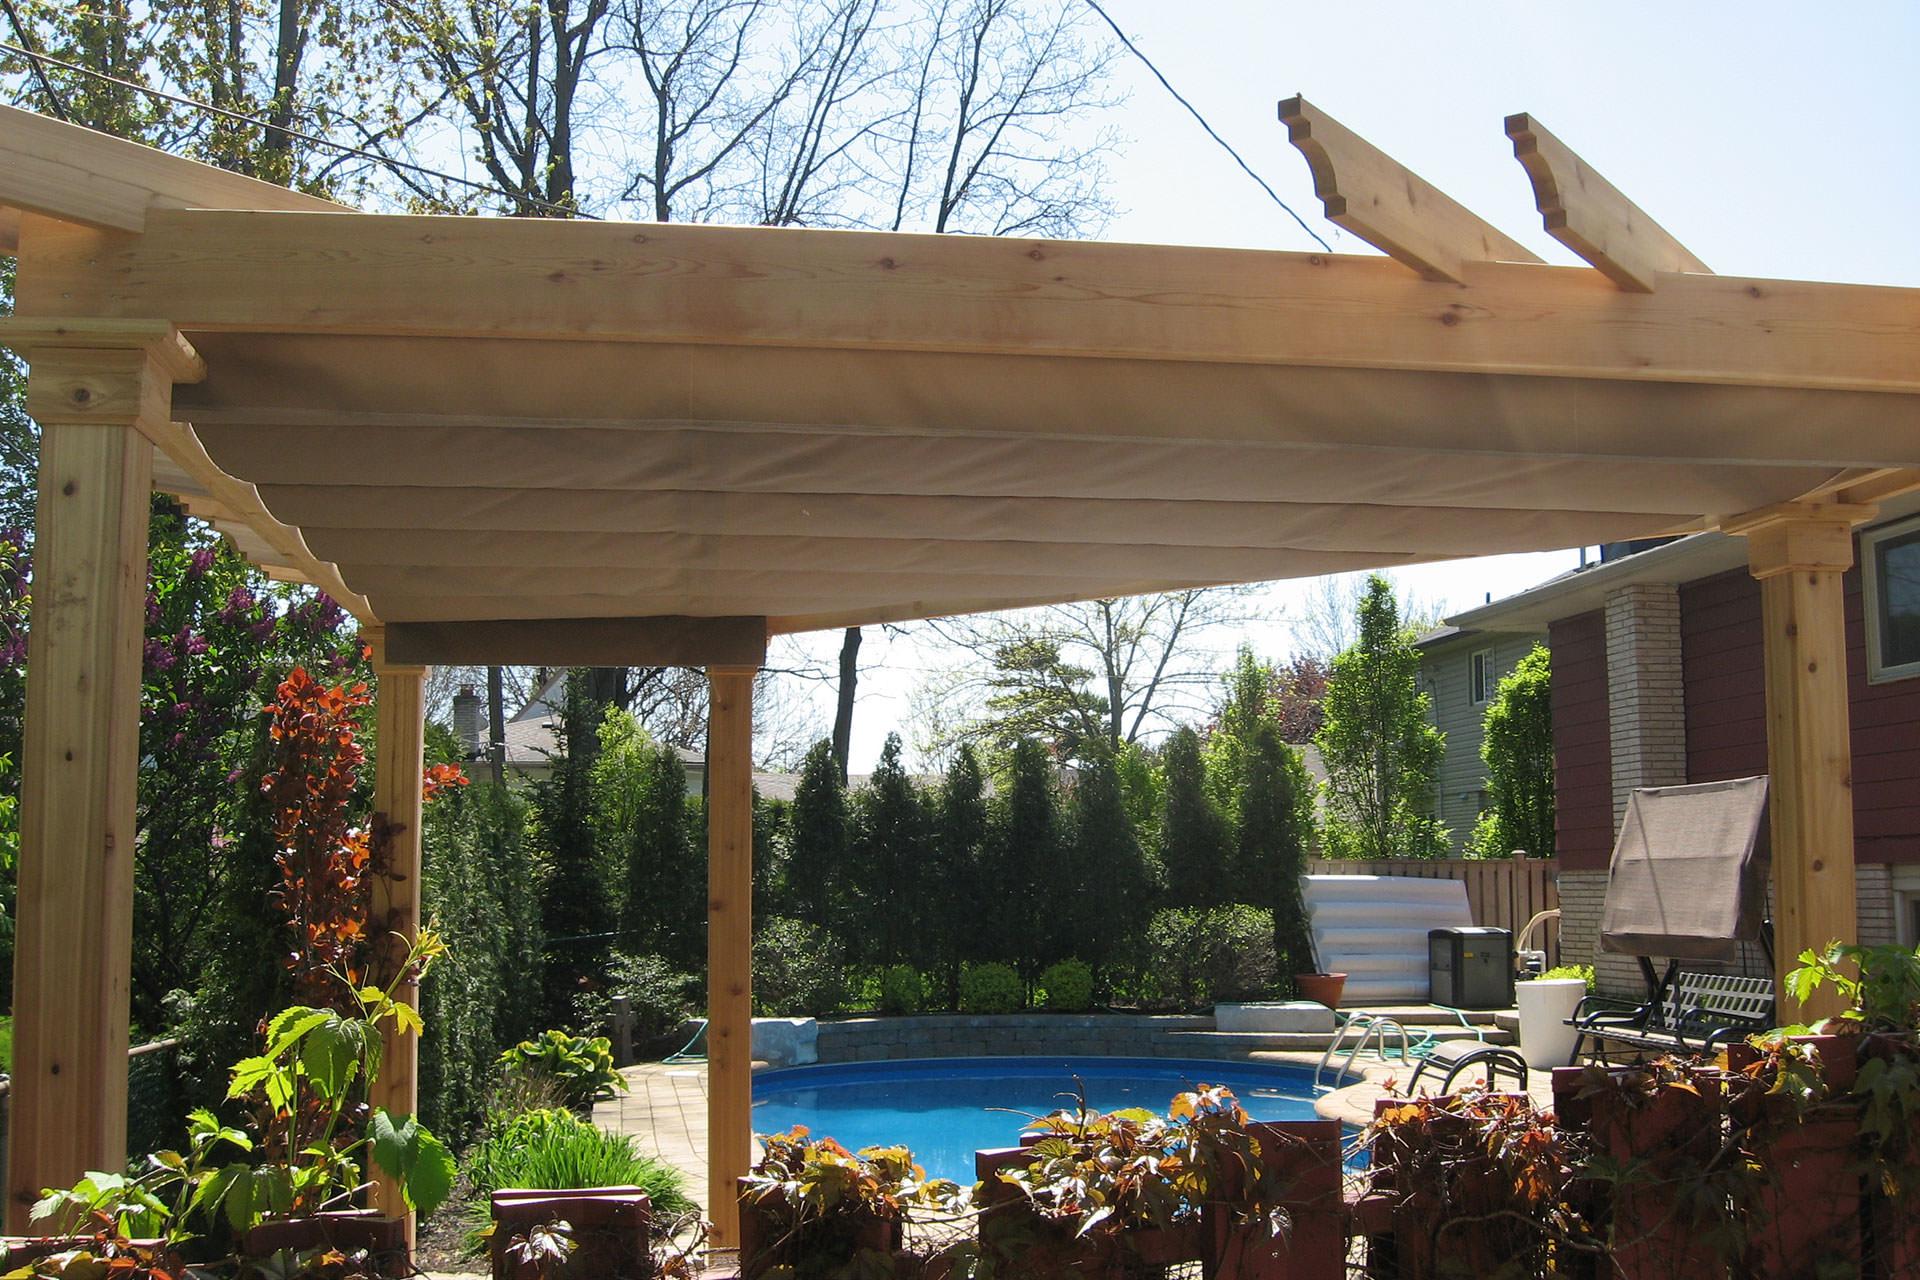 Pergola Design: Custom Canopy Ideas from ShadeFX on Covered Pergola Ideas  id=39777